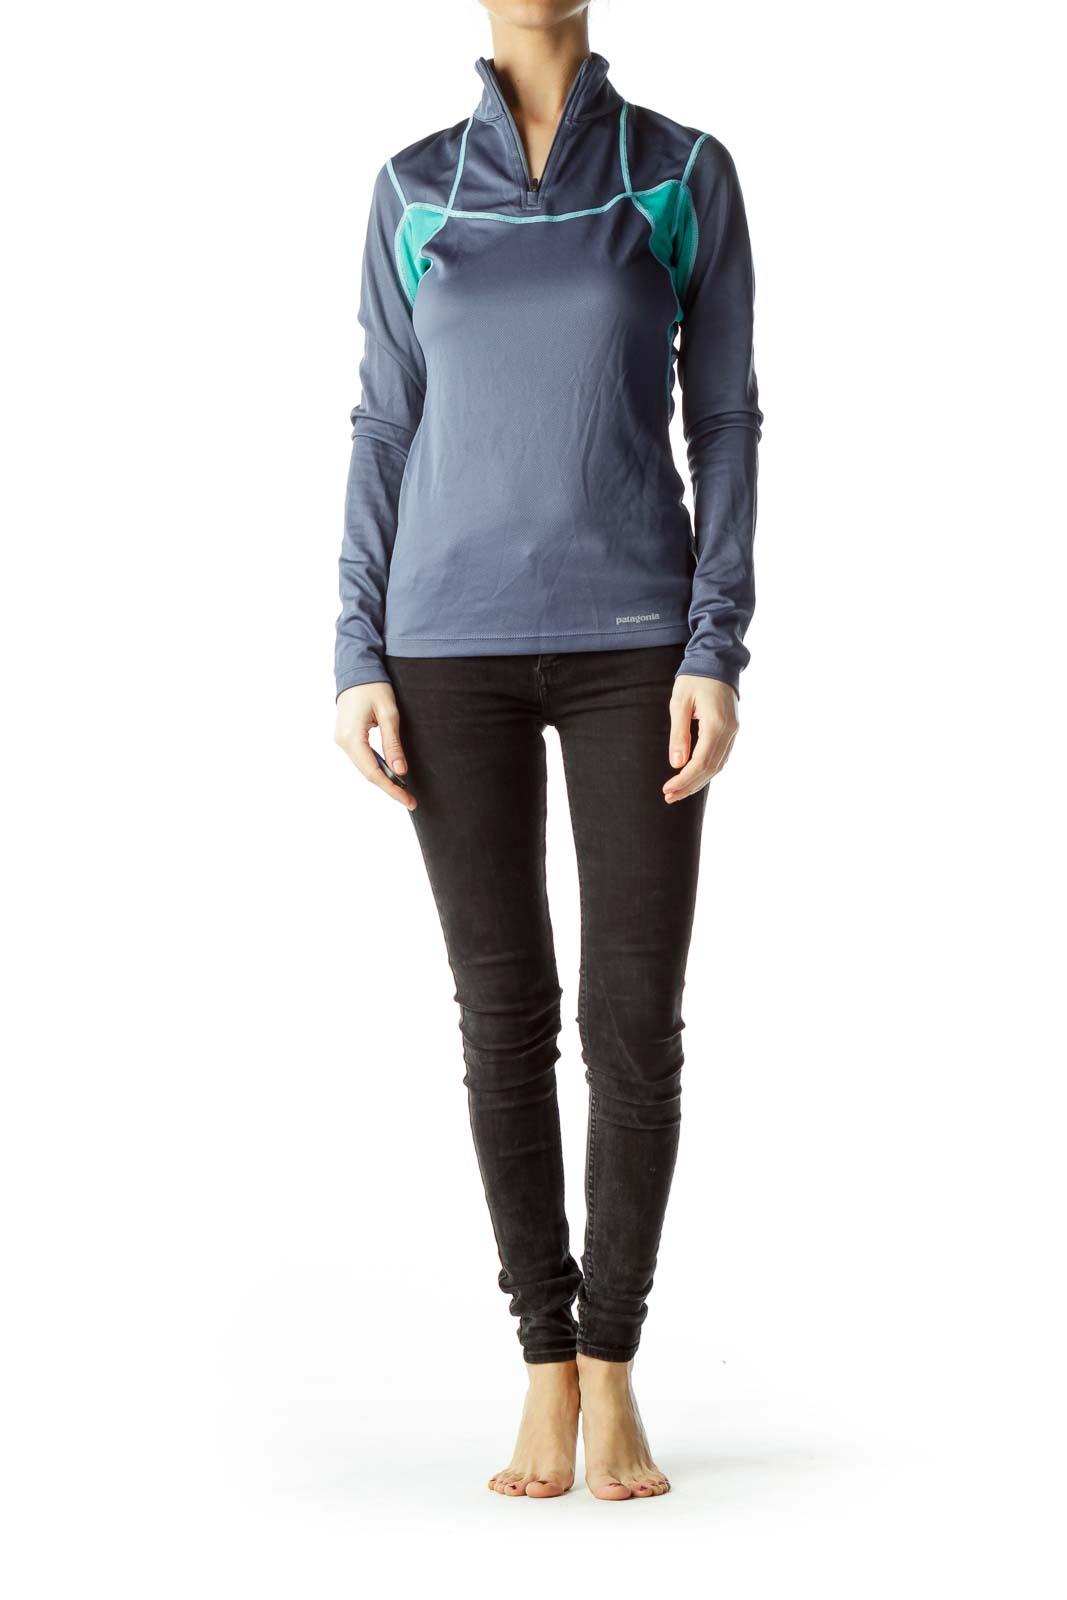 Blue Green Zippered Pullover Top